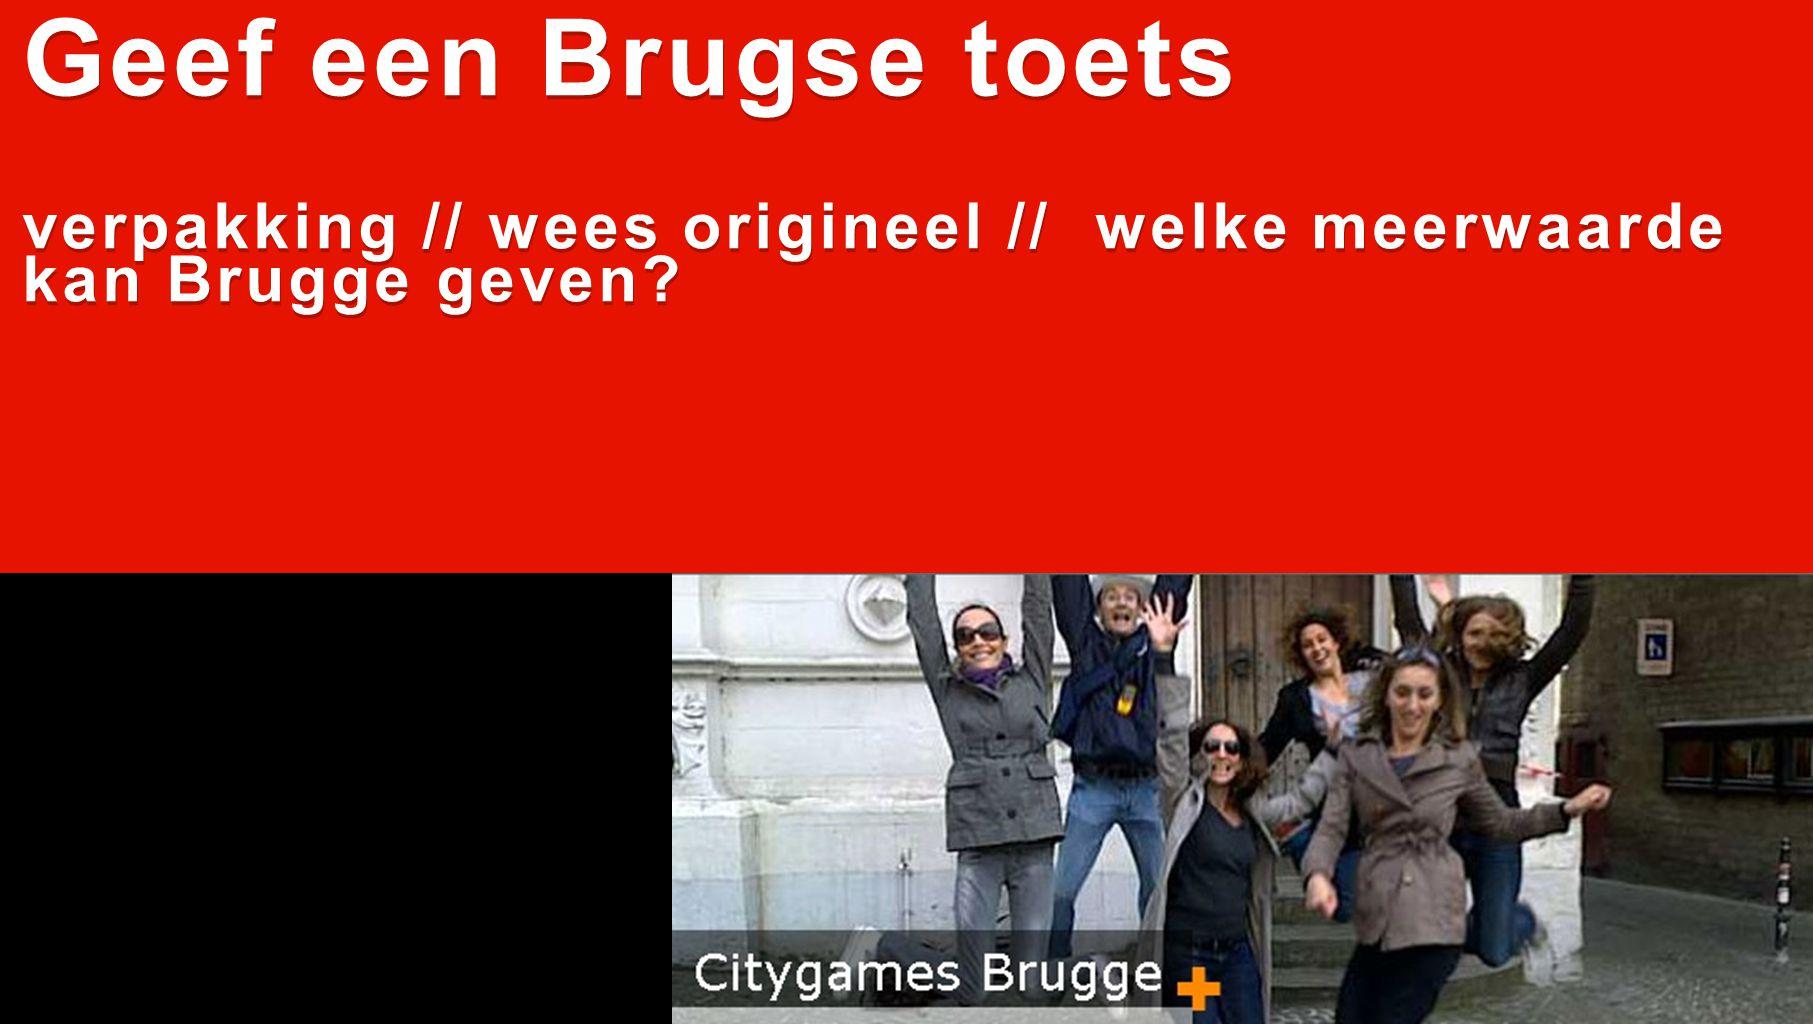 Geef een Brugse toets verpakking // wees origineel // welke meerwaarde kan Brugge geven.